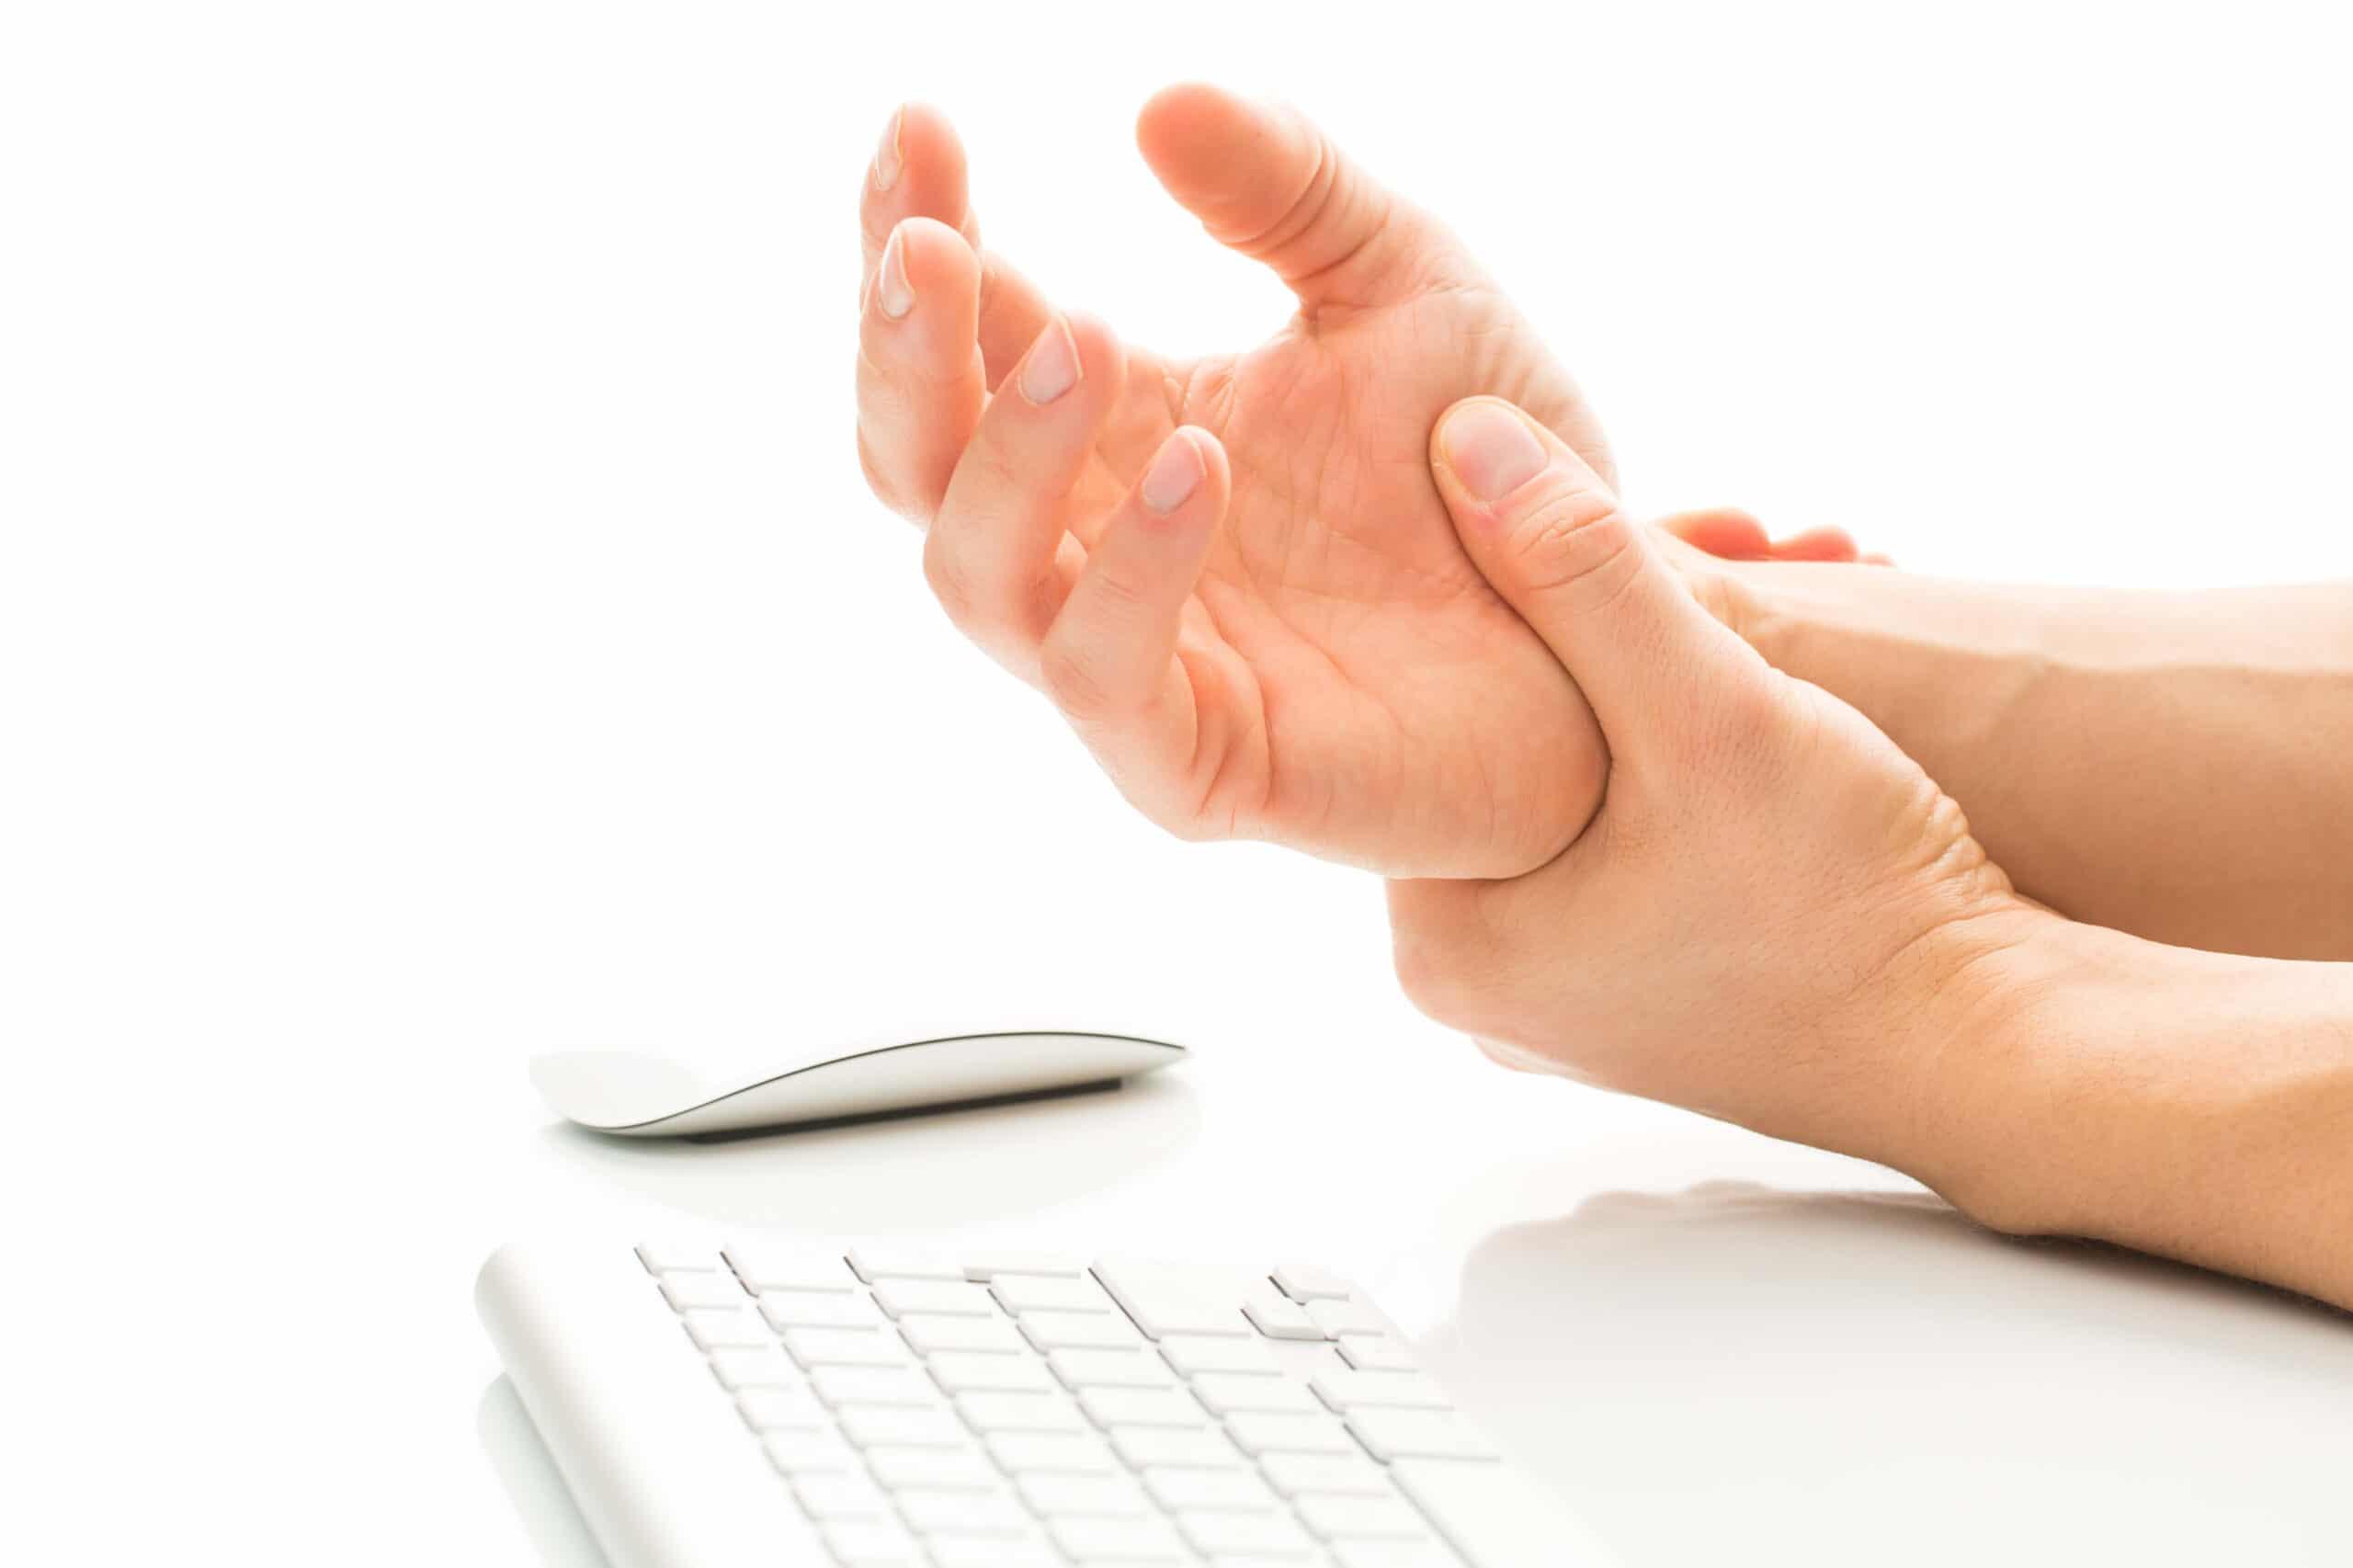 sindromul de tunel carpian la mana